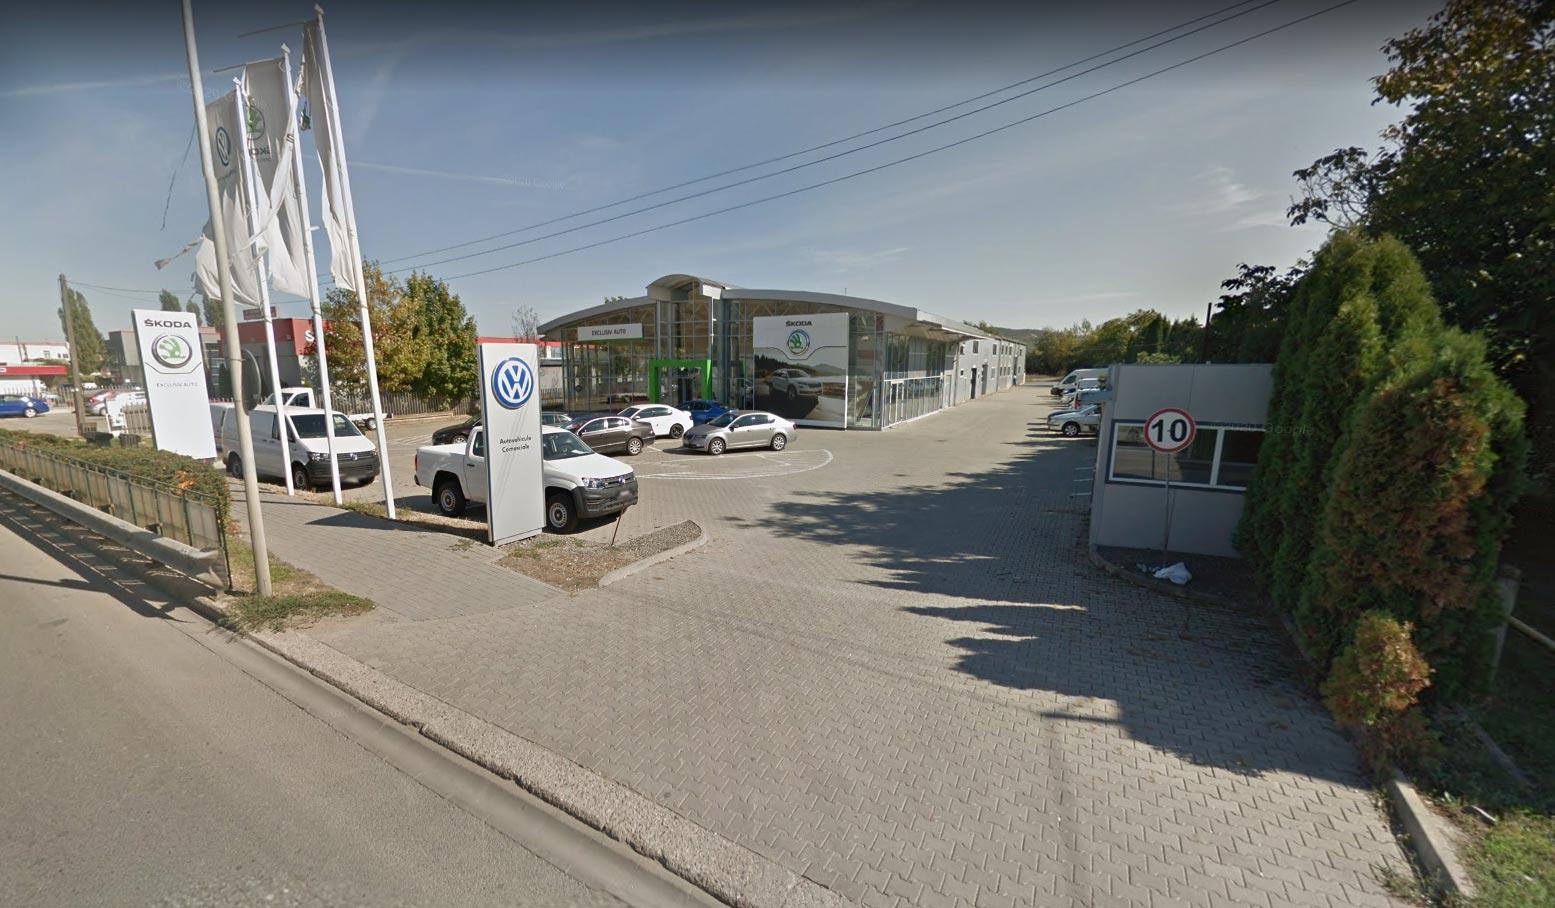 Spatiu comercial 979mp + extindere 684mp + teren intravilan 7.952mp, Alba Iulia, jud. Alba